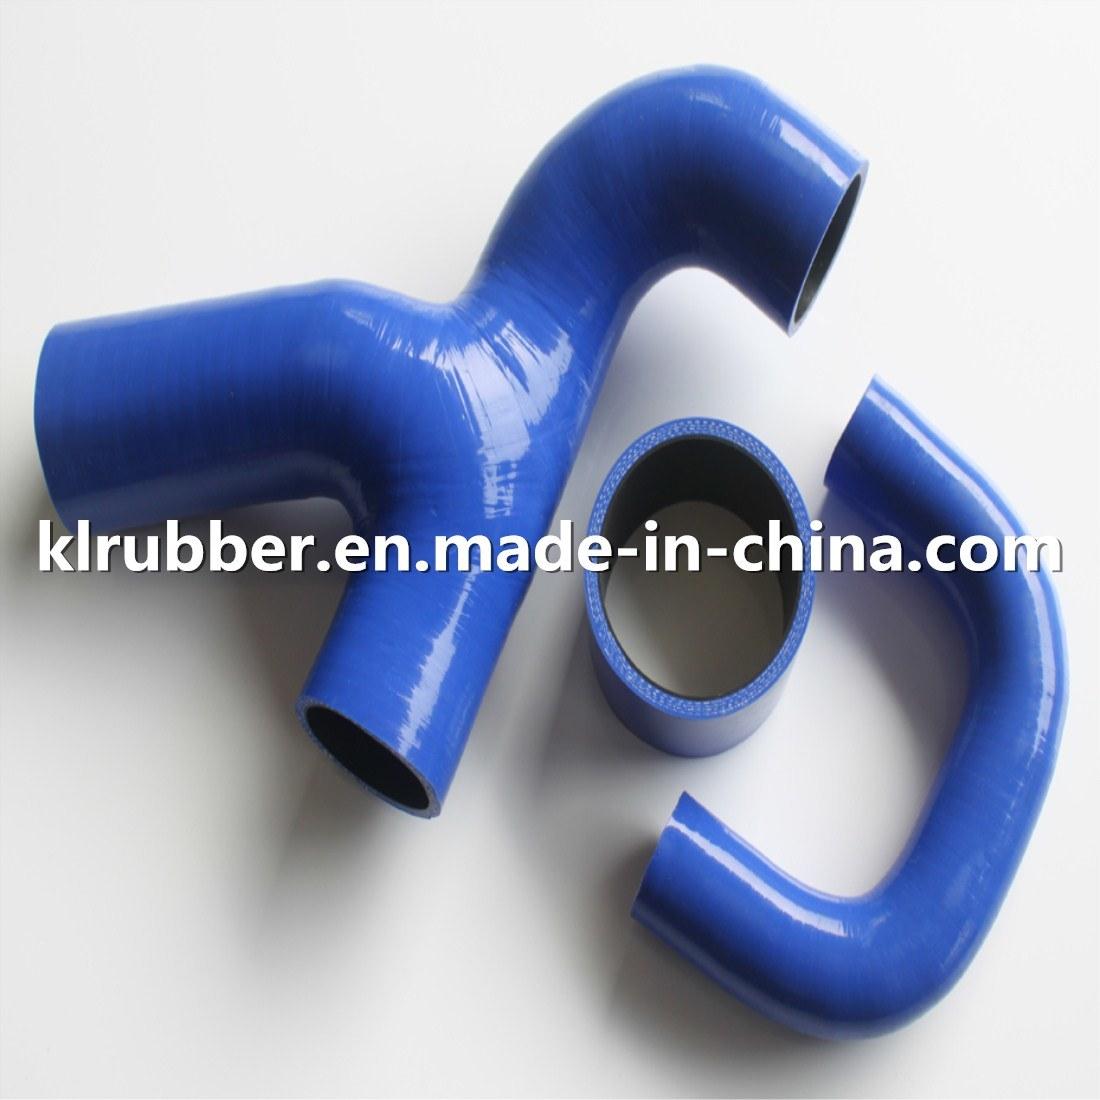 Custom Flexible Silicone Rubber Auto Turbo Radiator Hose